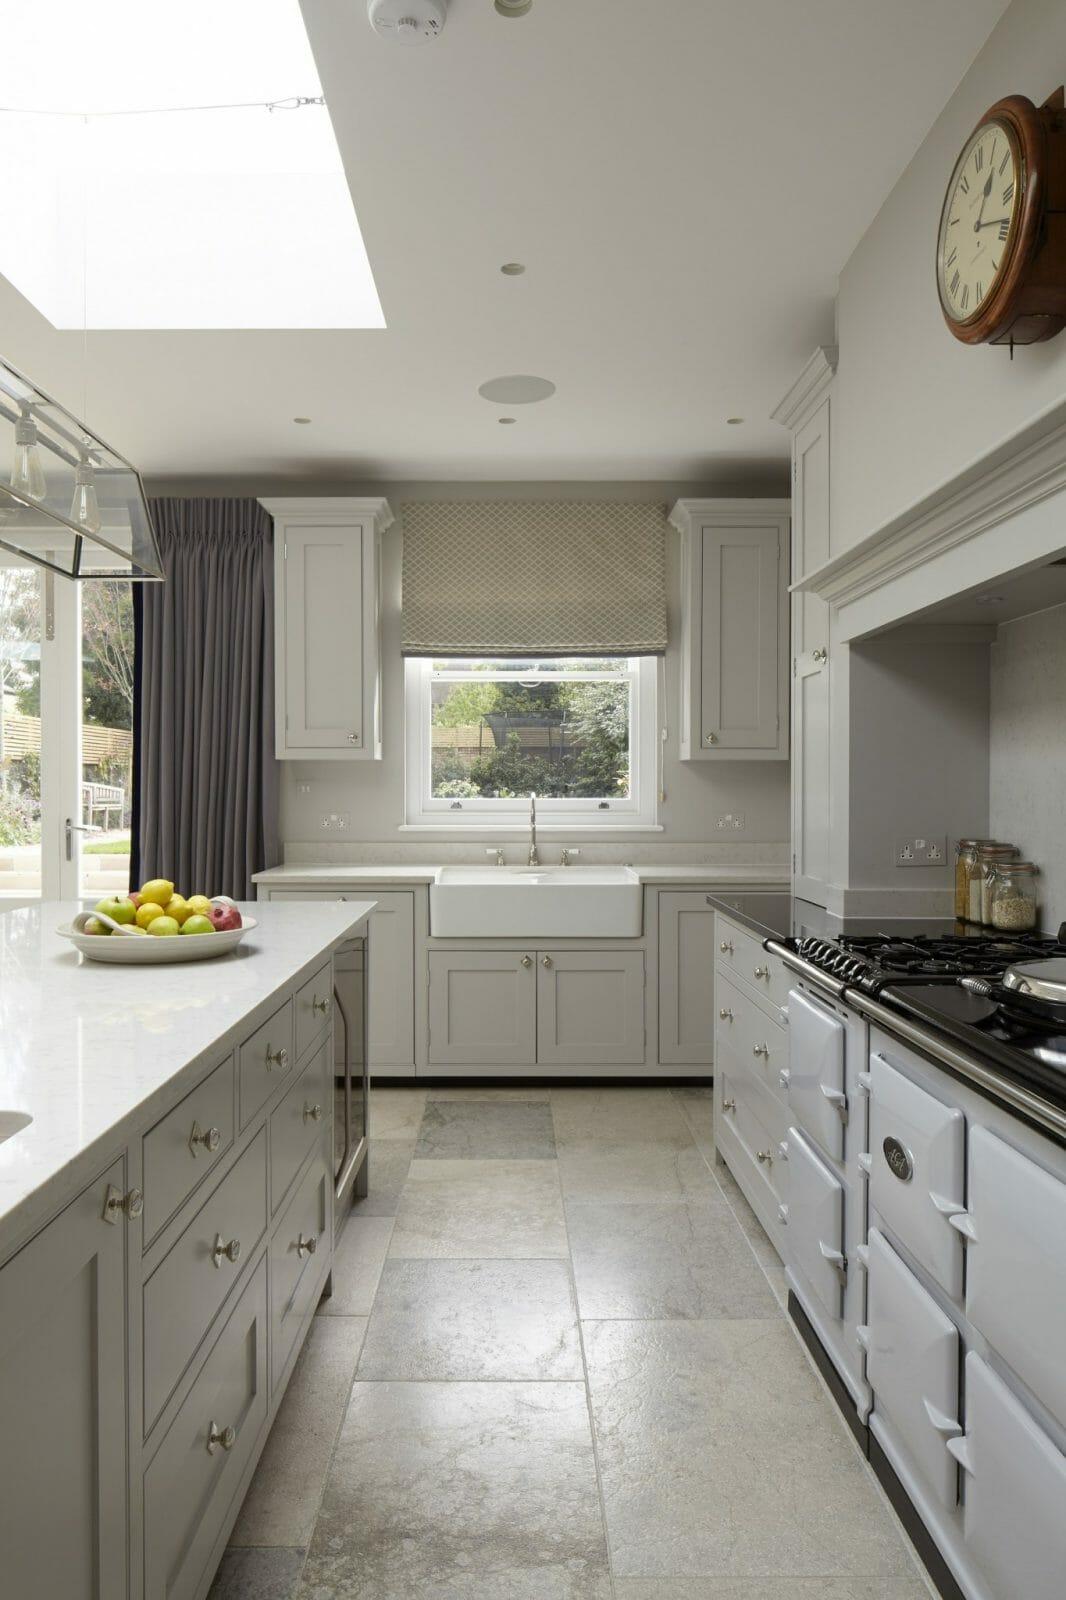 Farmhouse Kitchen Design Pictures